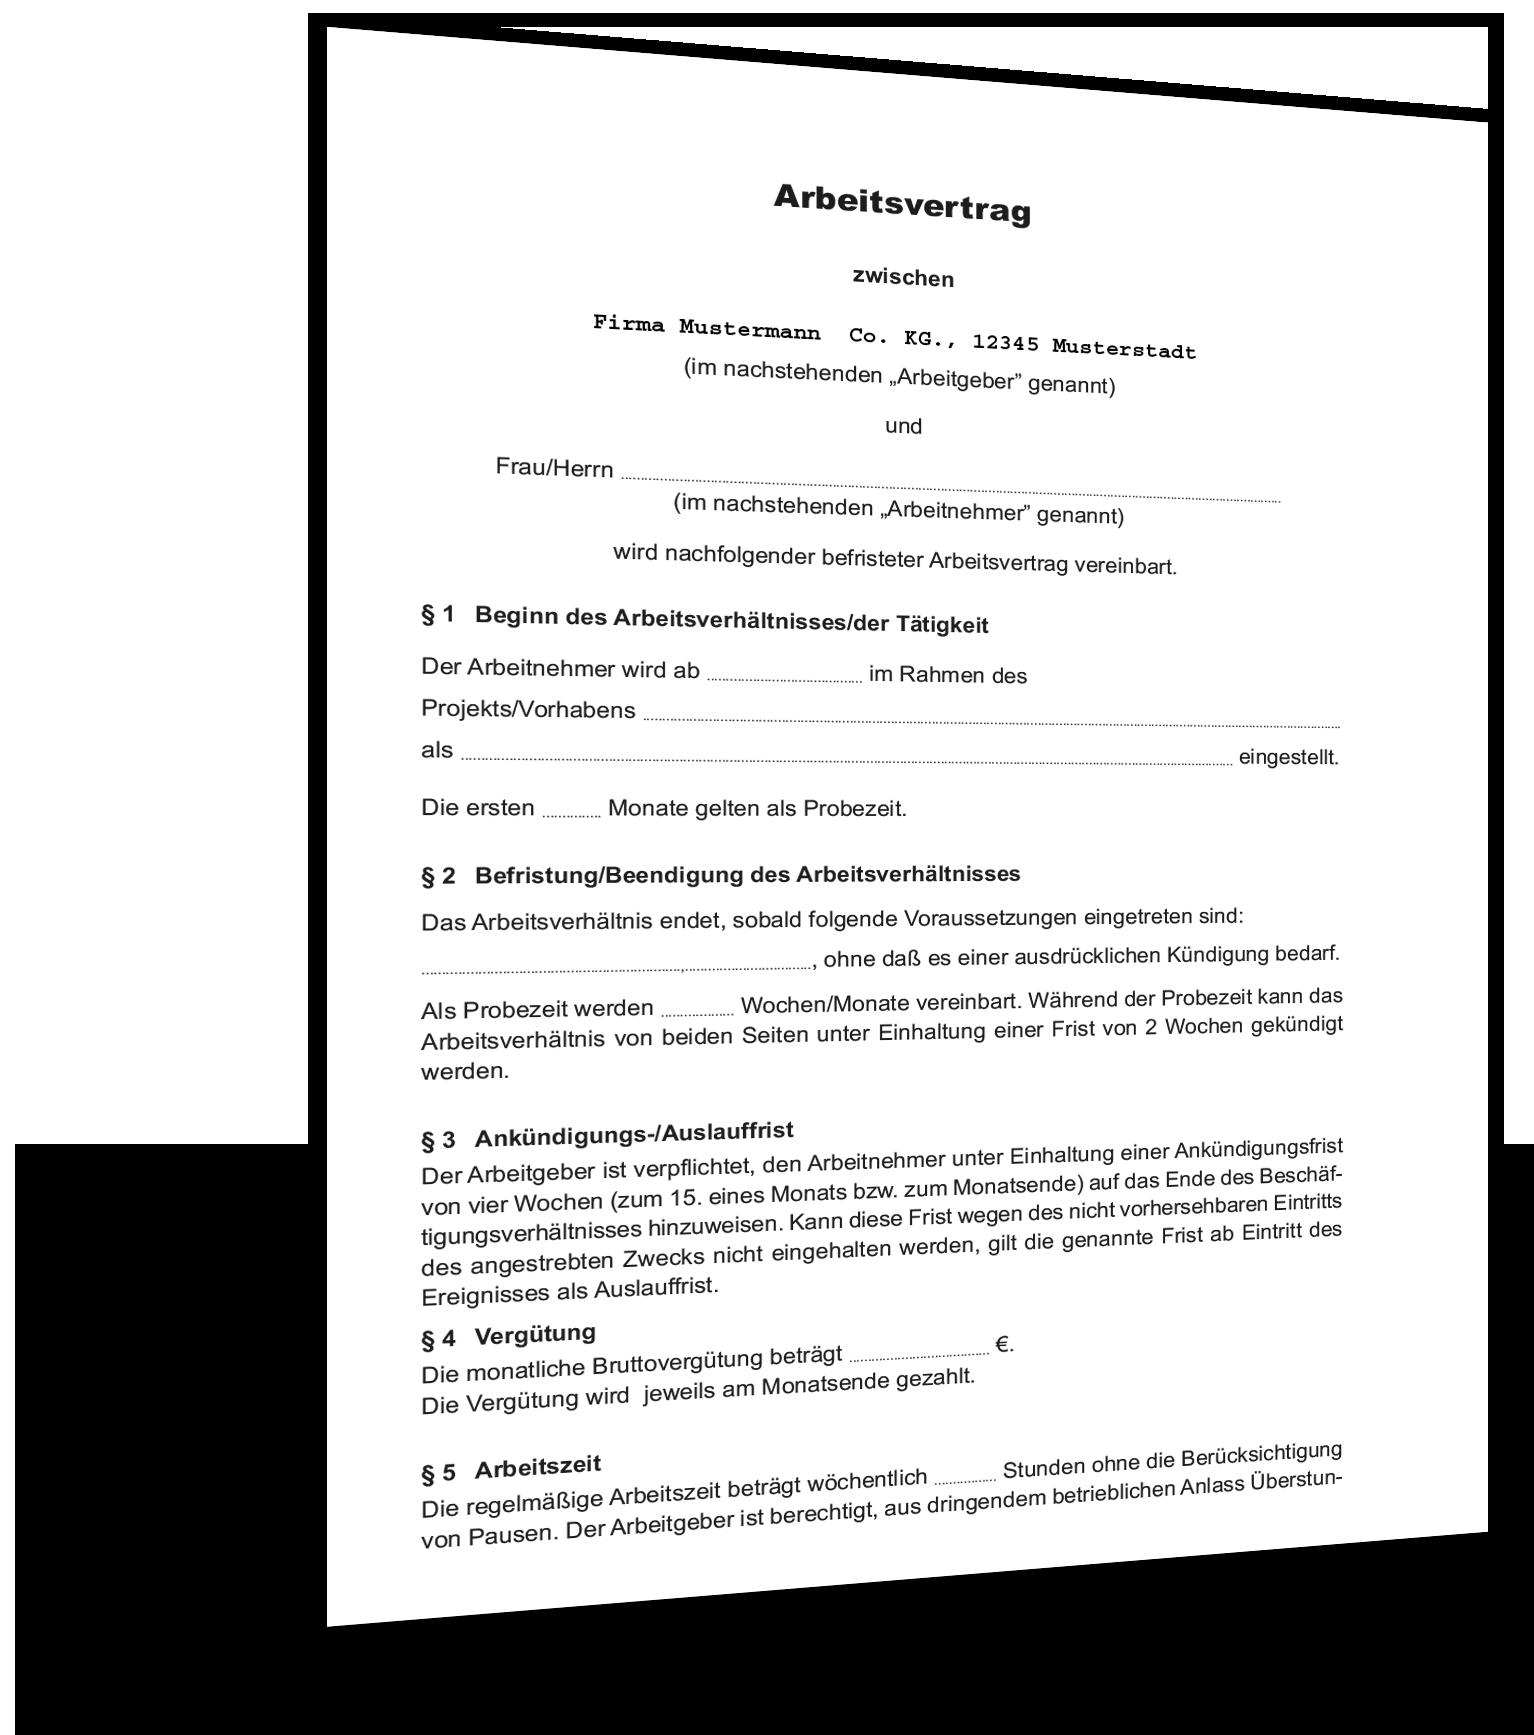 kurzfristige beschftigung. befristeter arbeitsvertrag002119740_1 ...